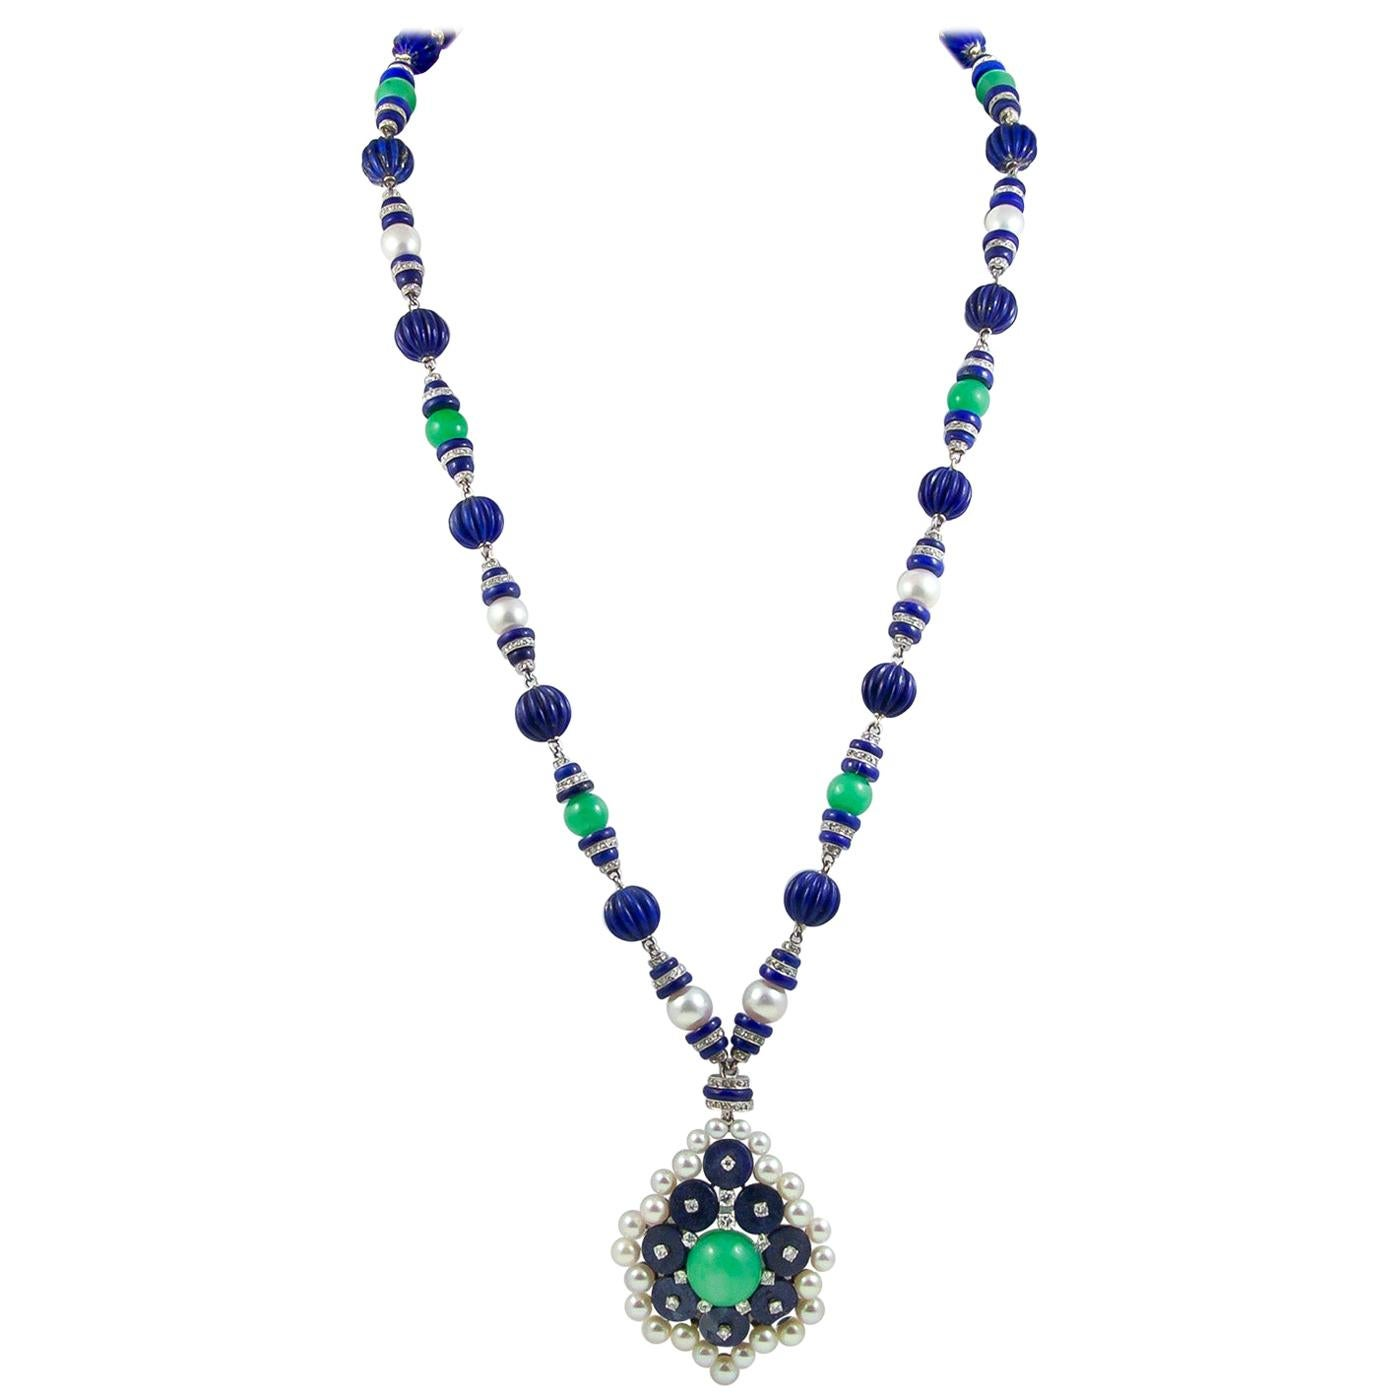 Van Cleef & Arpels Two-Tone Jadeite Jade, Lapis Lazuli, Diamond Pearl Necklace